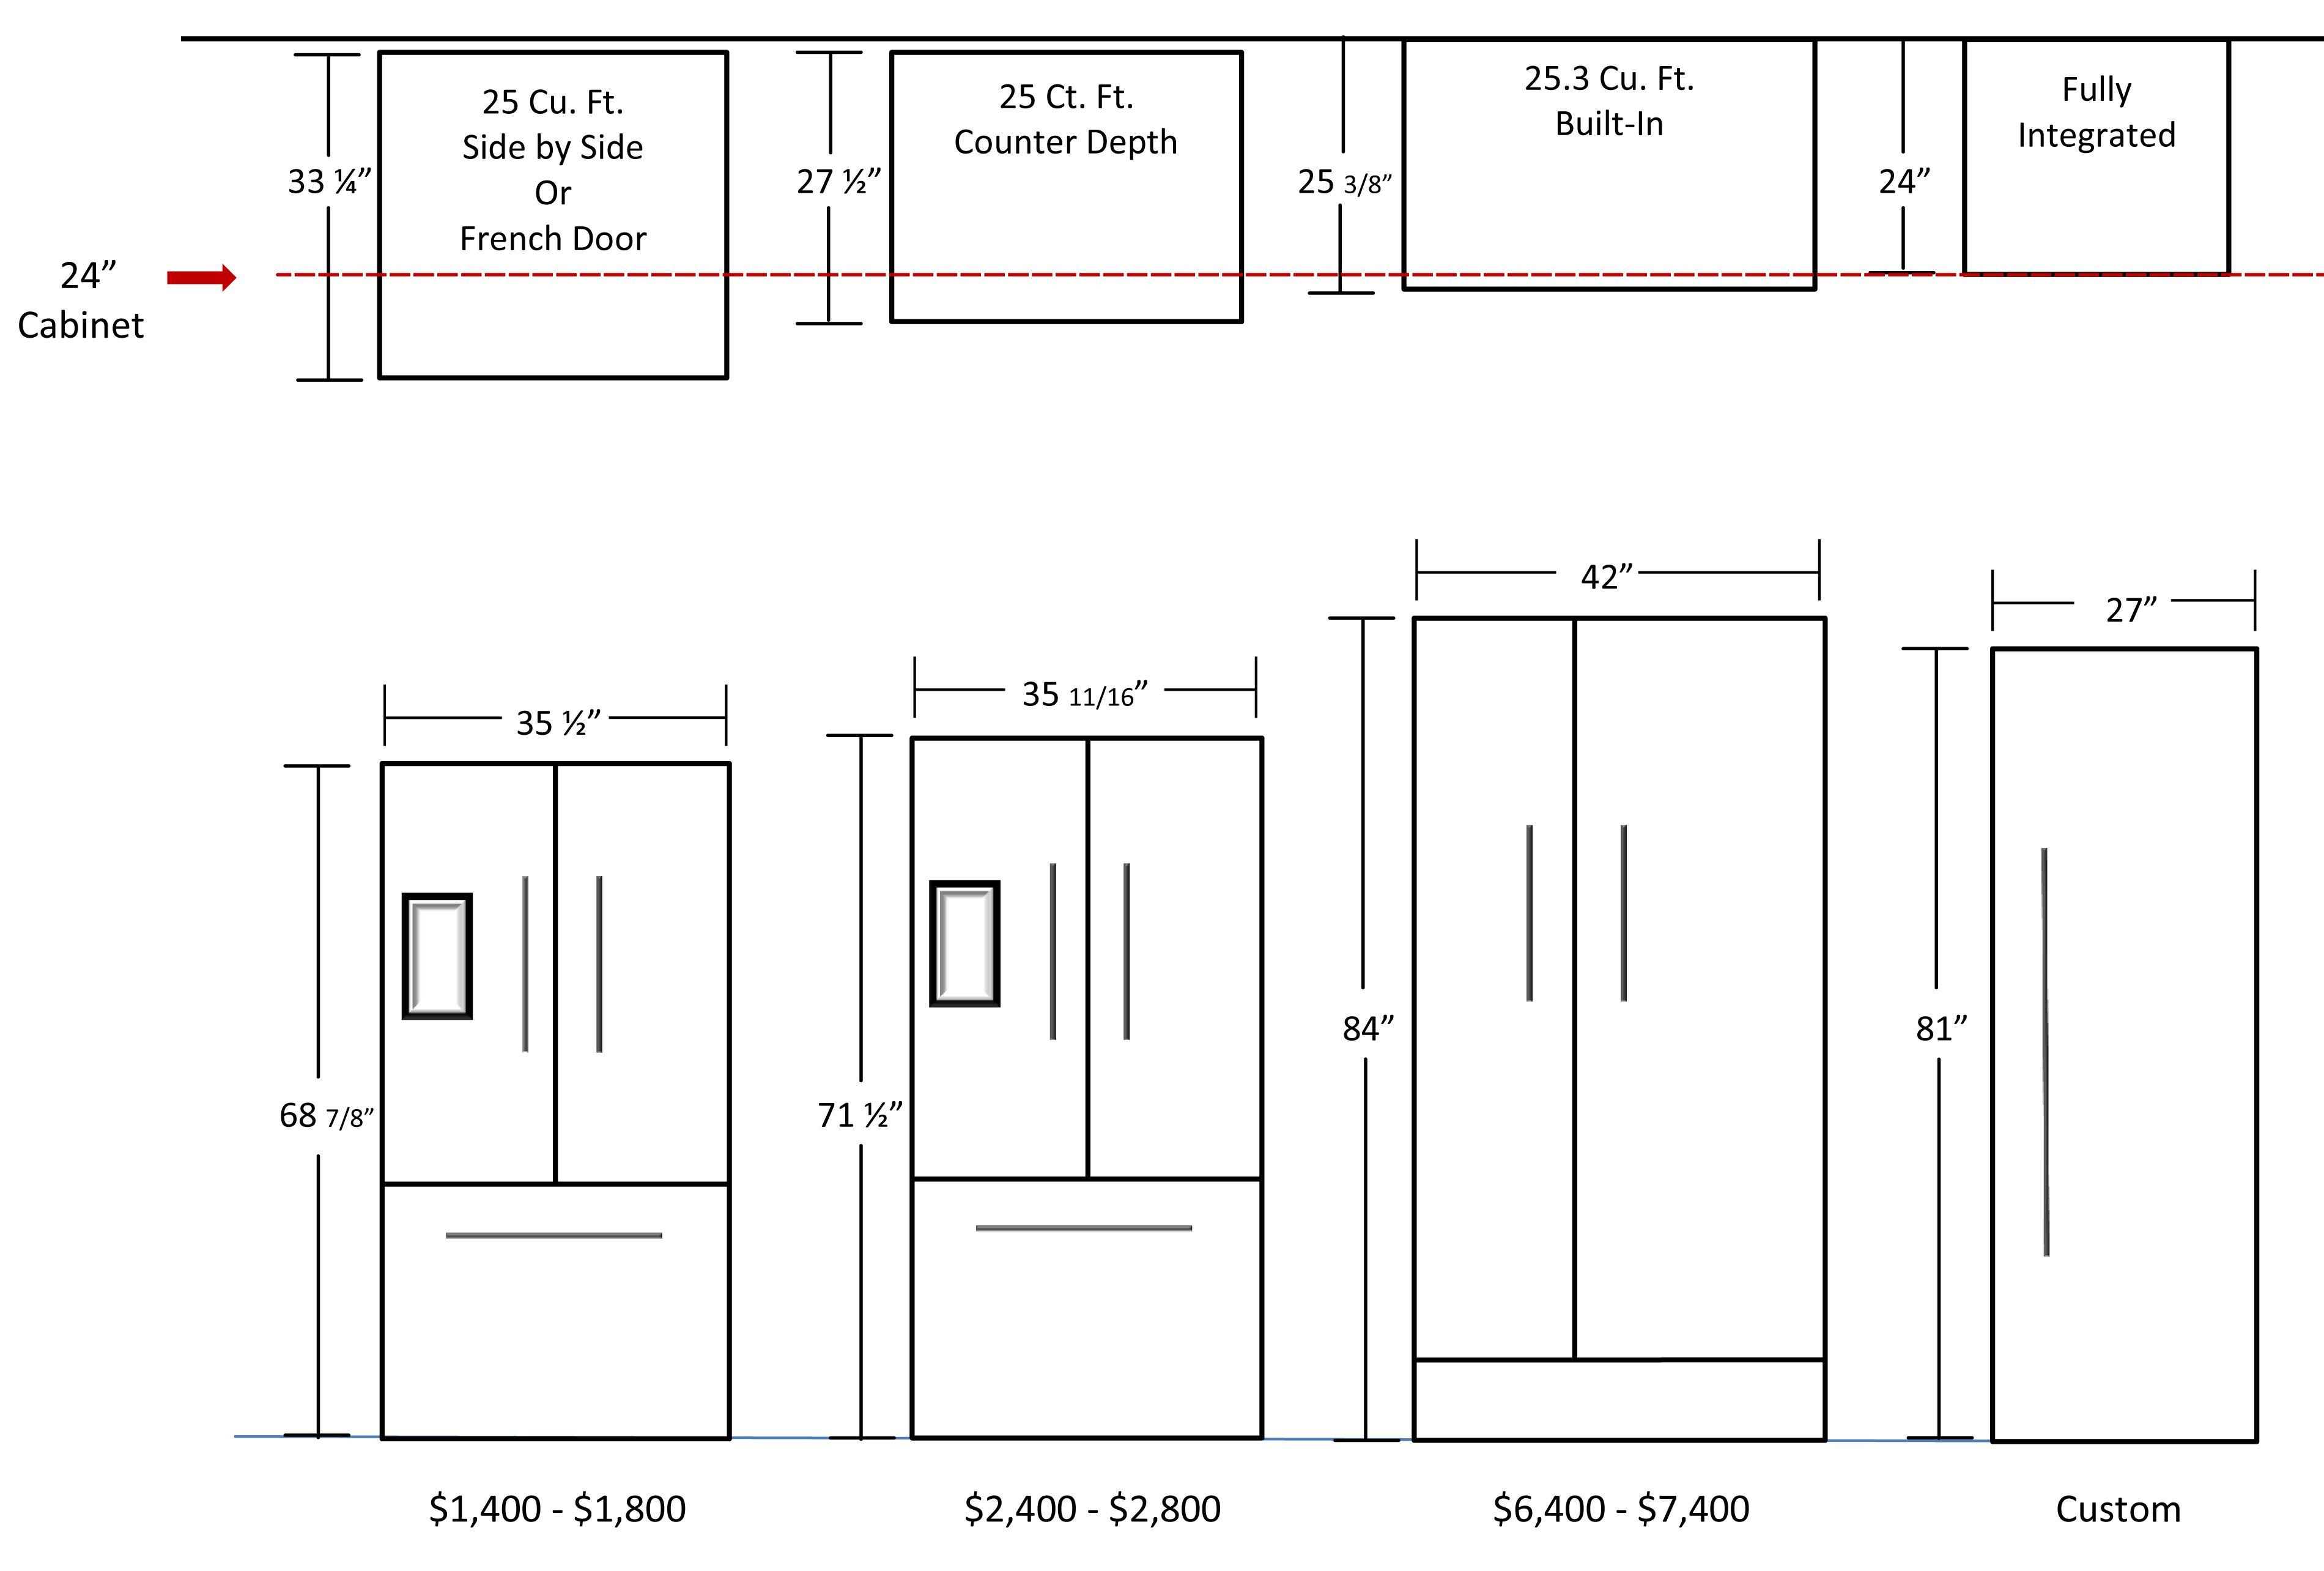 Images Average Refrigerator Size Refrigerator Dimensions Fridge Dimensions Refrigerator Sizes